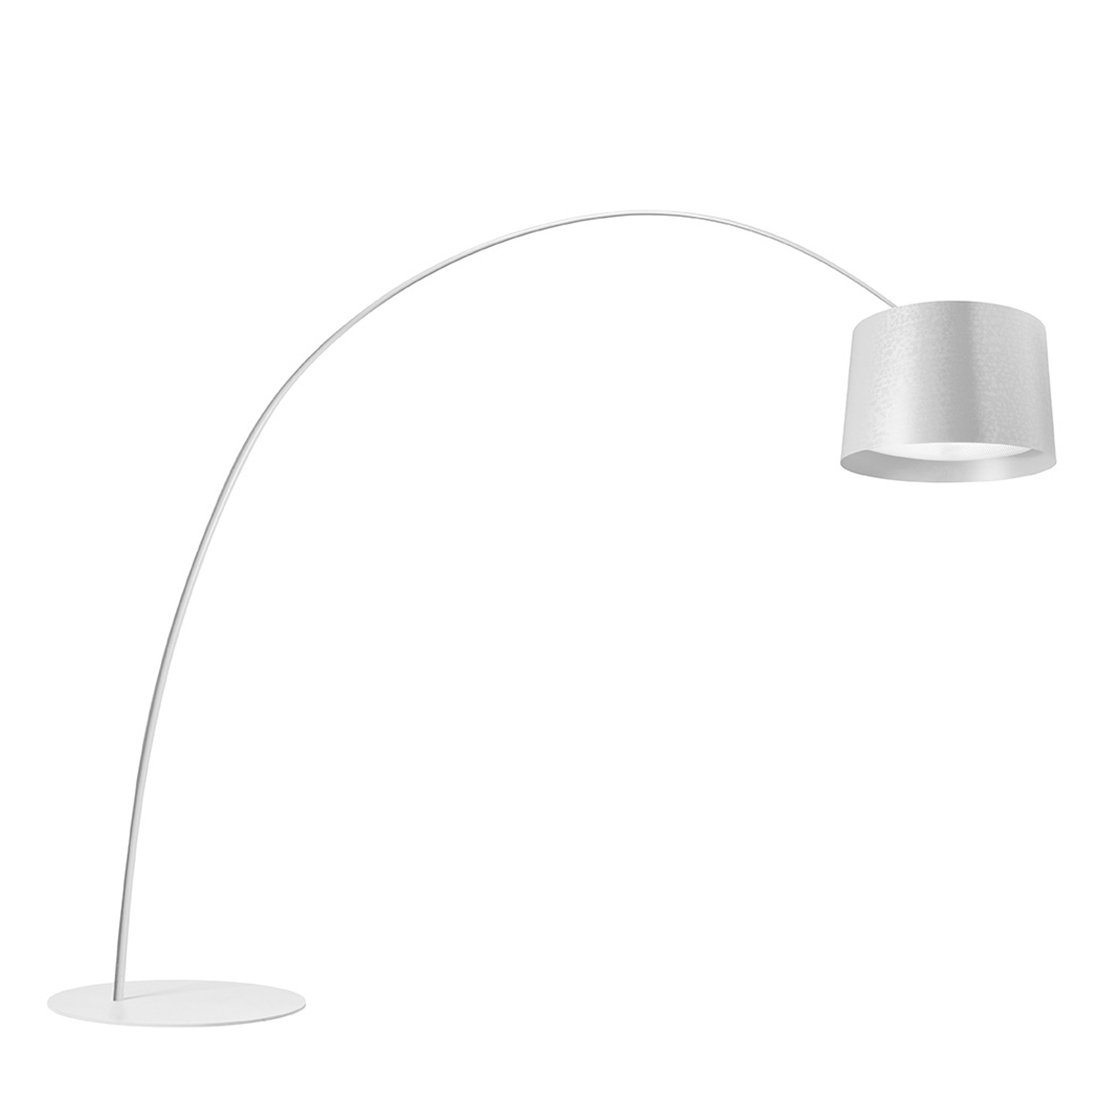 Foscarini Twice As Twiggy Vloerlamp - Wit